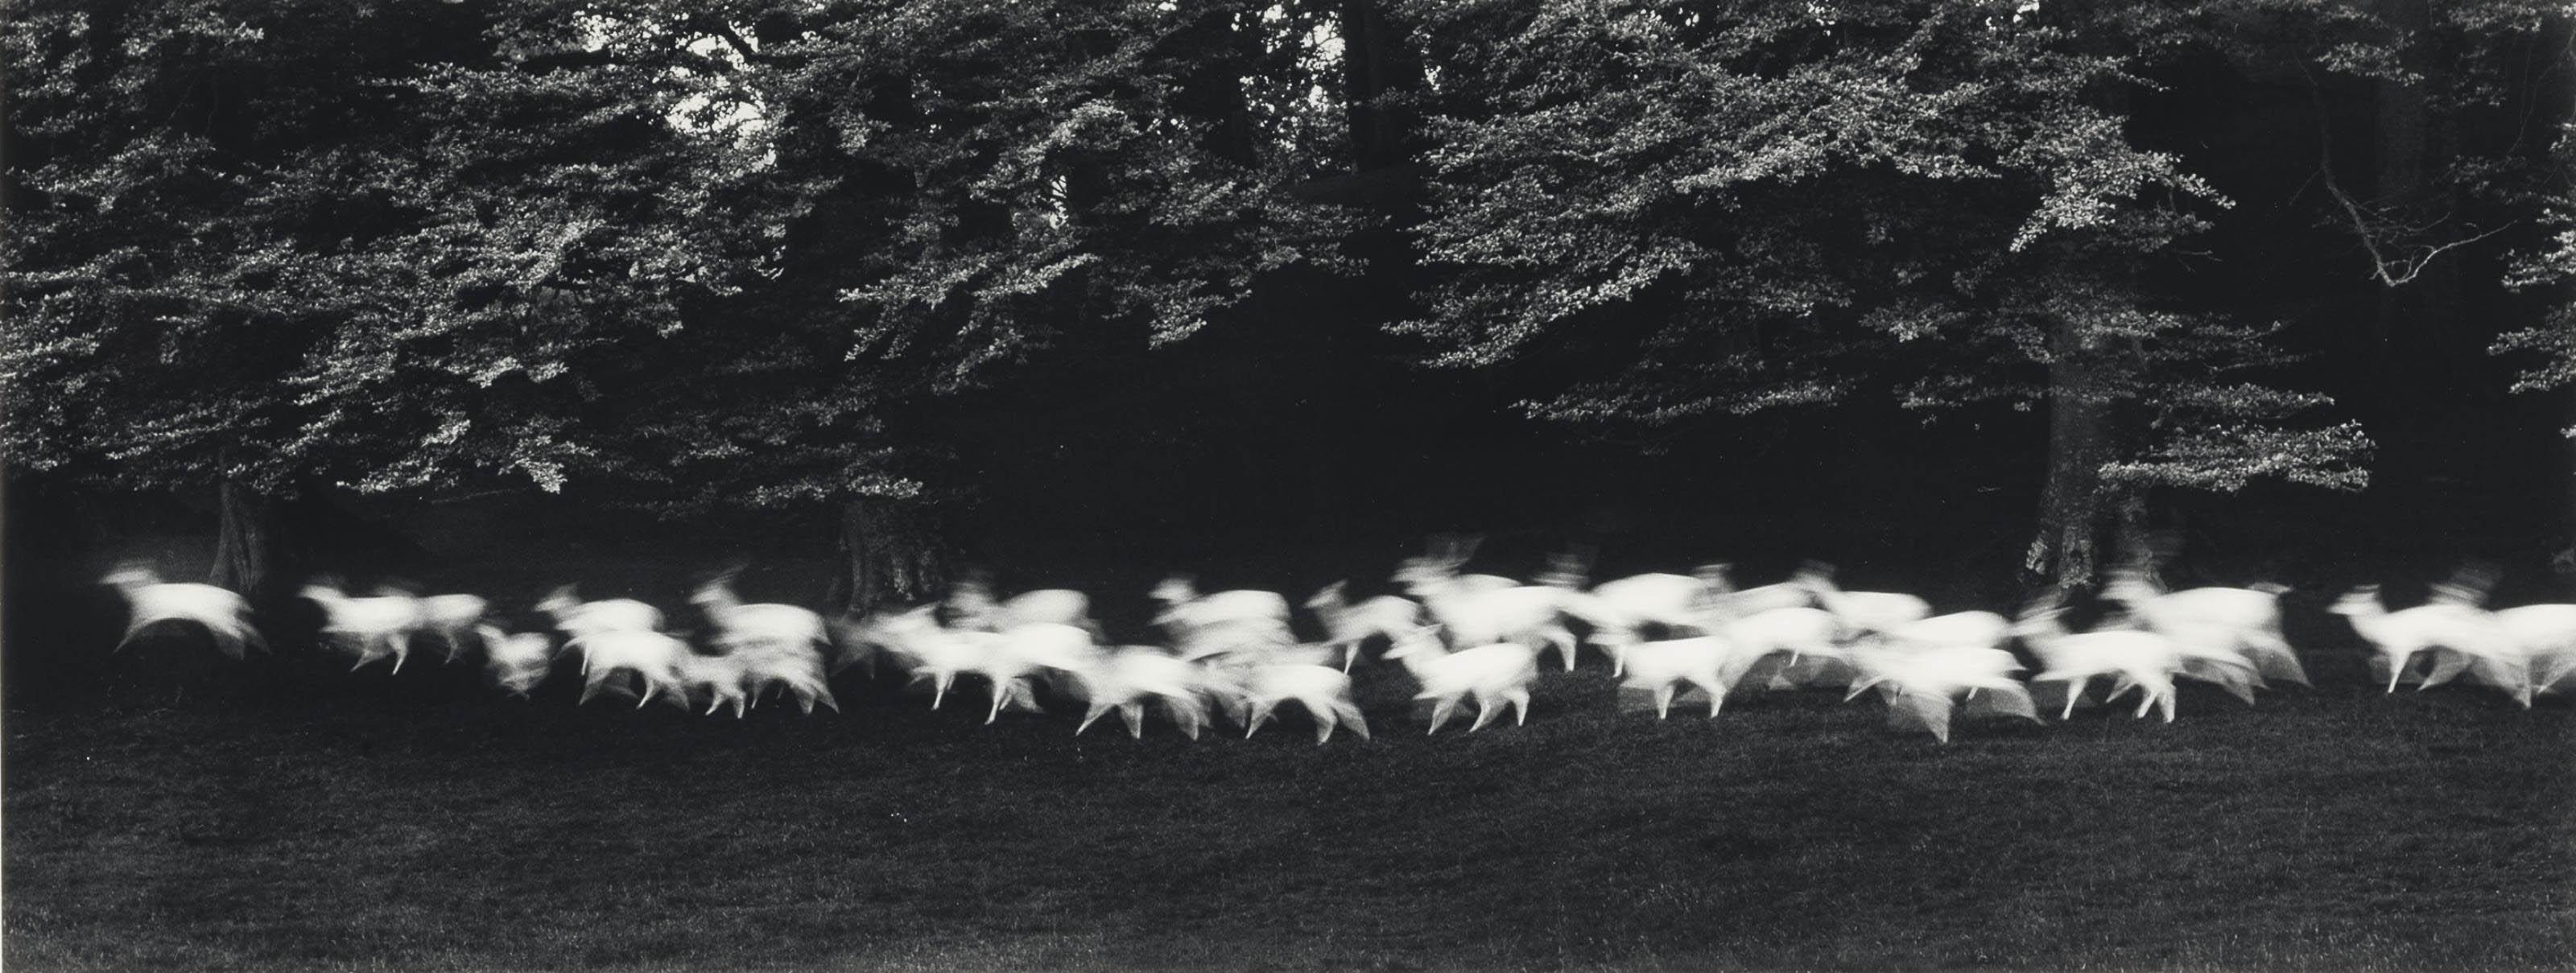 Running White Deer, County Wicklow, Ireland, 1967